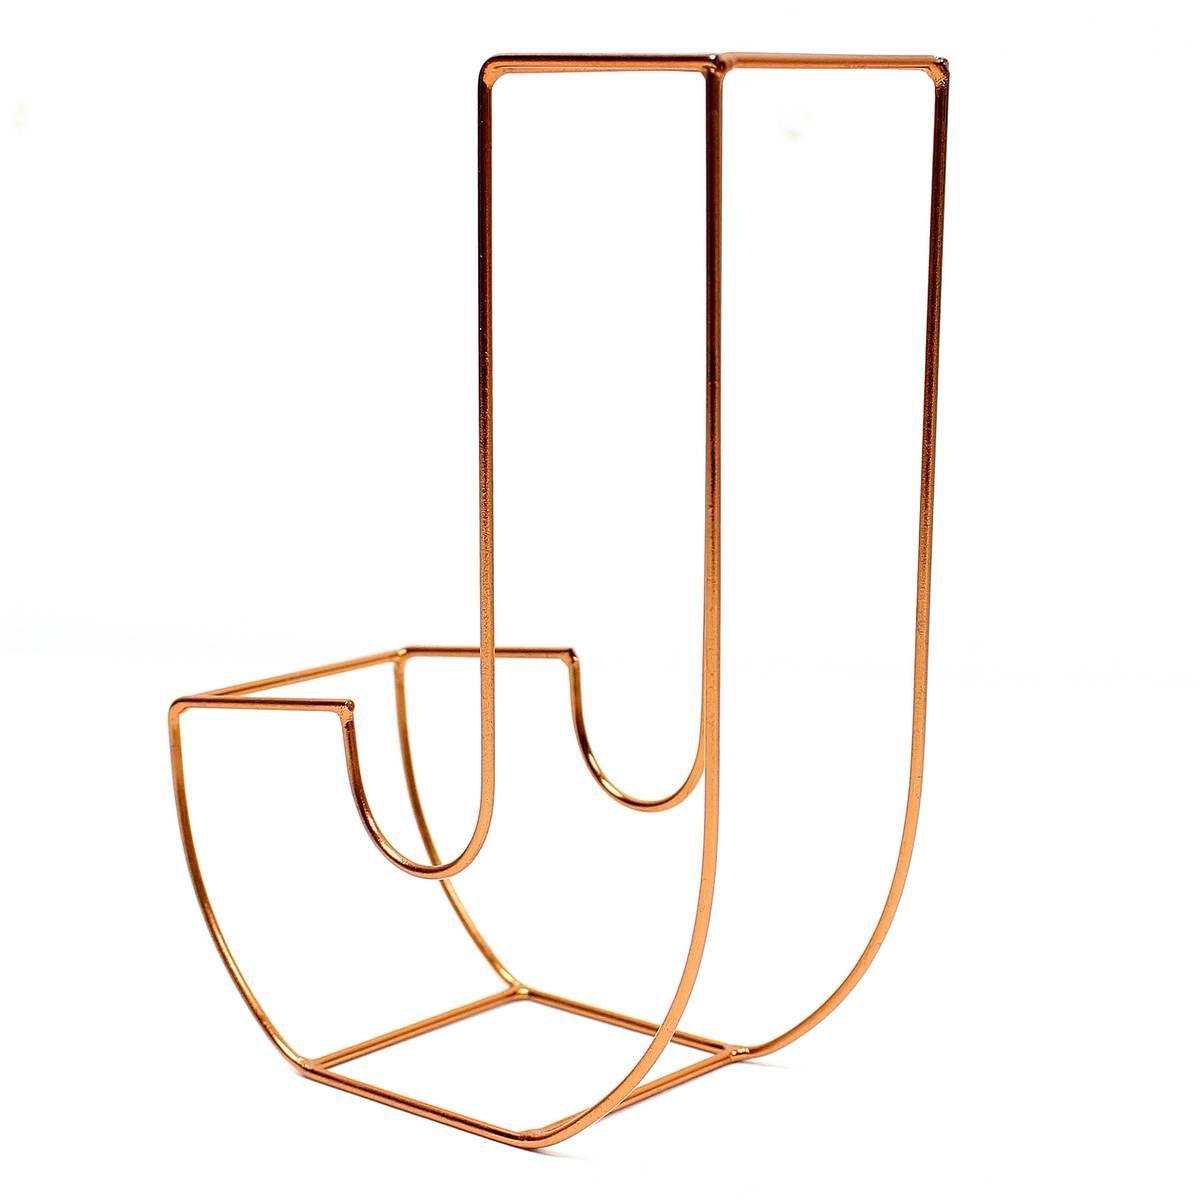 Copper Wire Letter J 15 Cm | Hobbycraft | Home Inventory | Pinterest ...